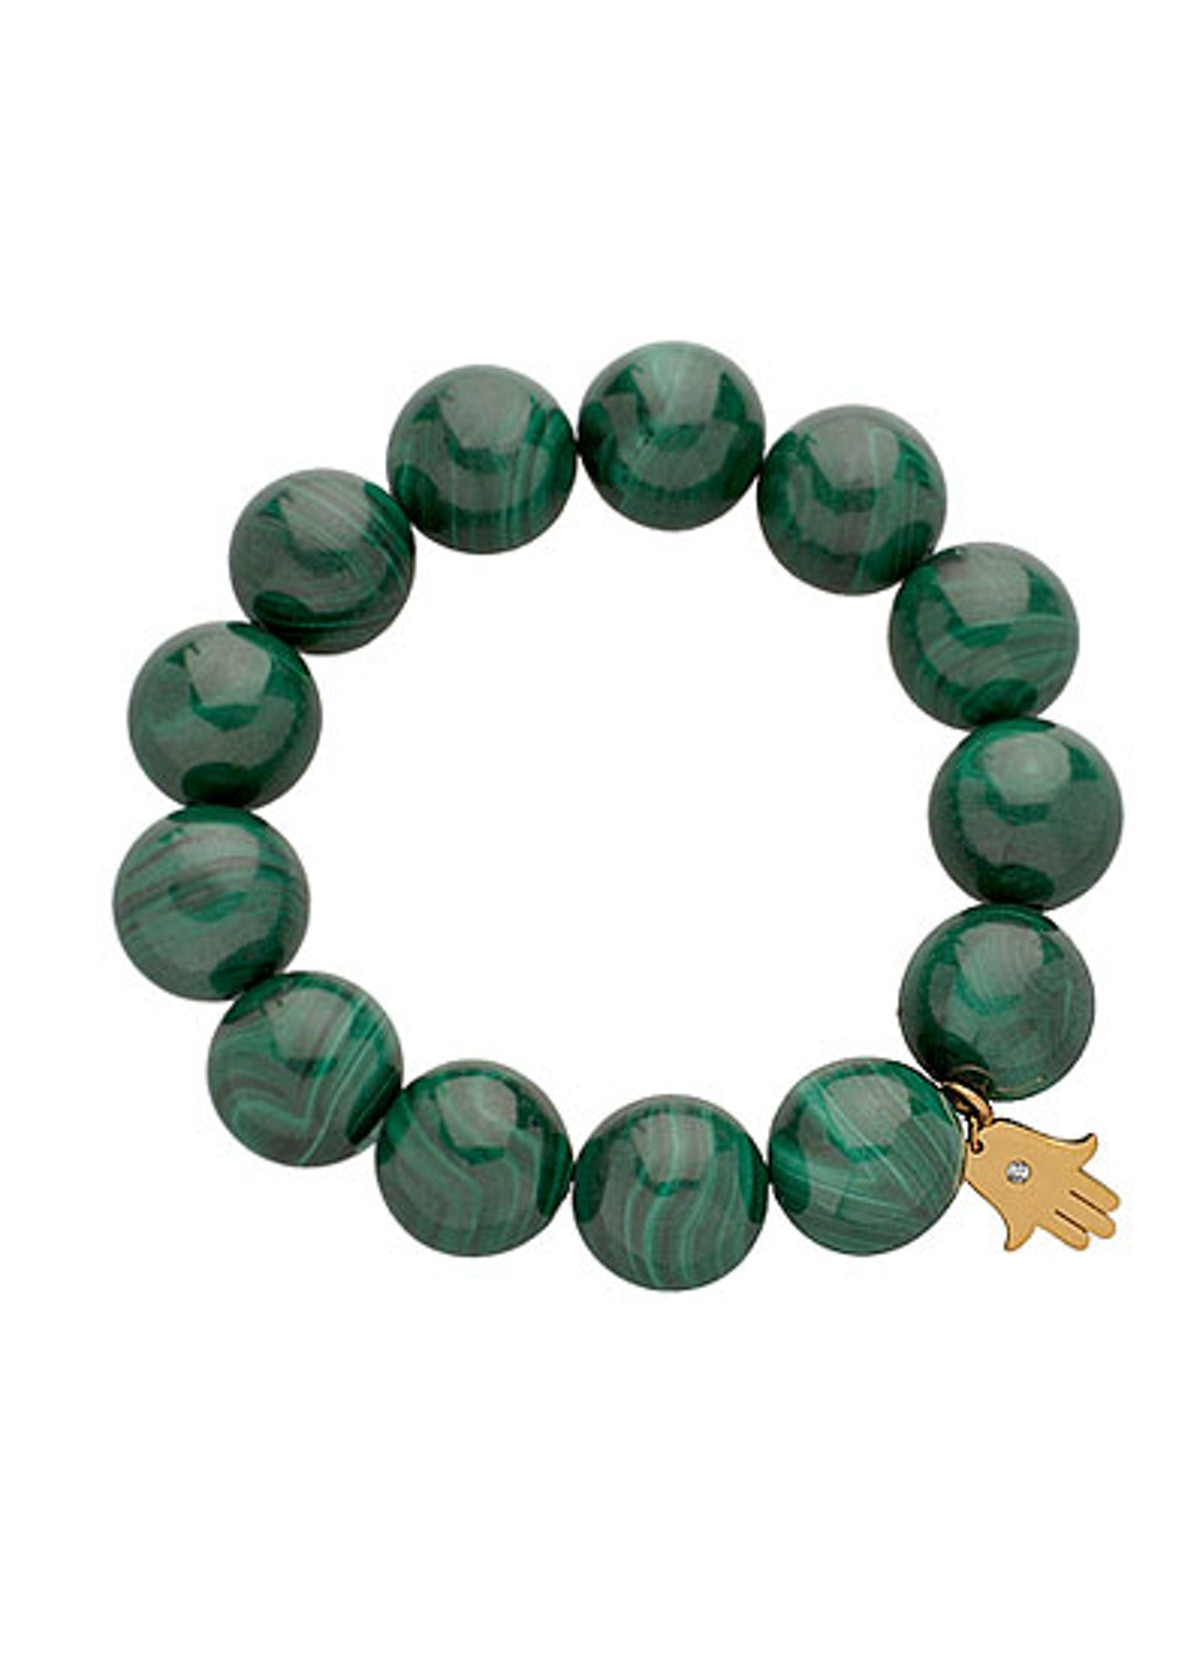 acss-malachite-jewelry-04-v.jpg